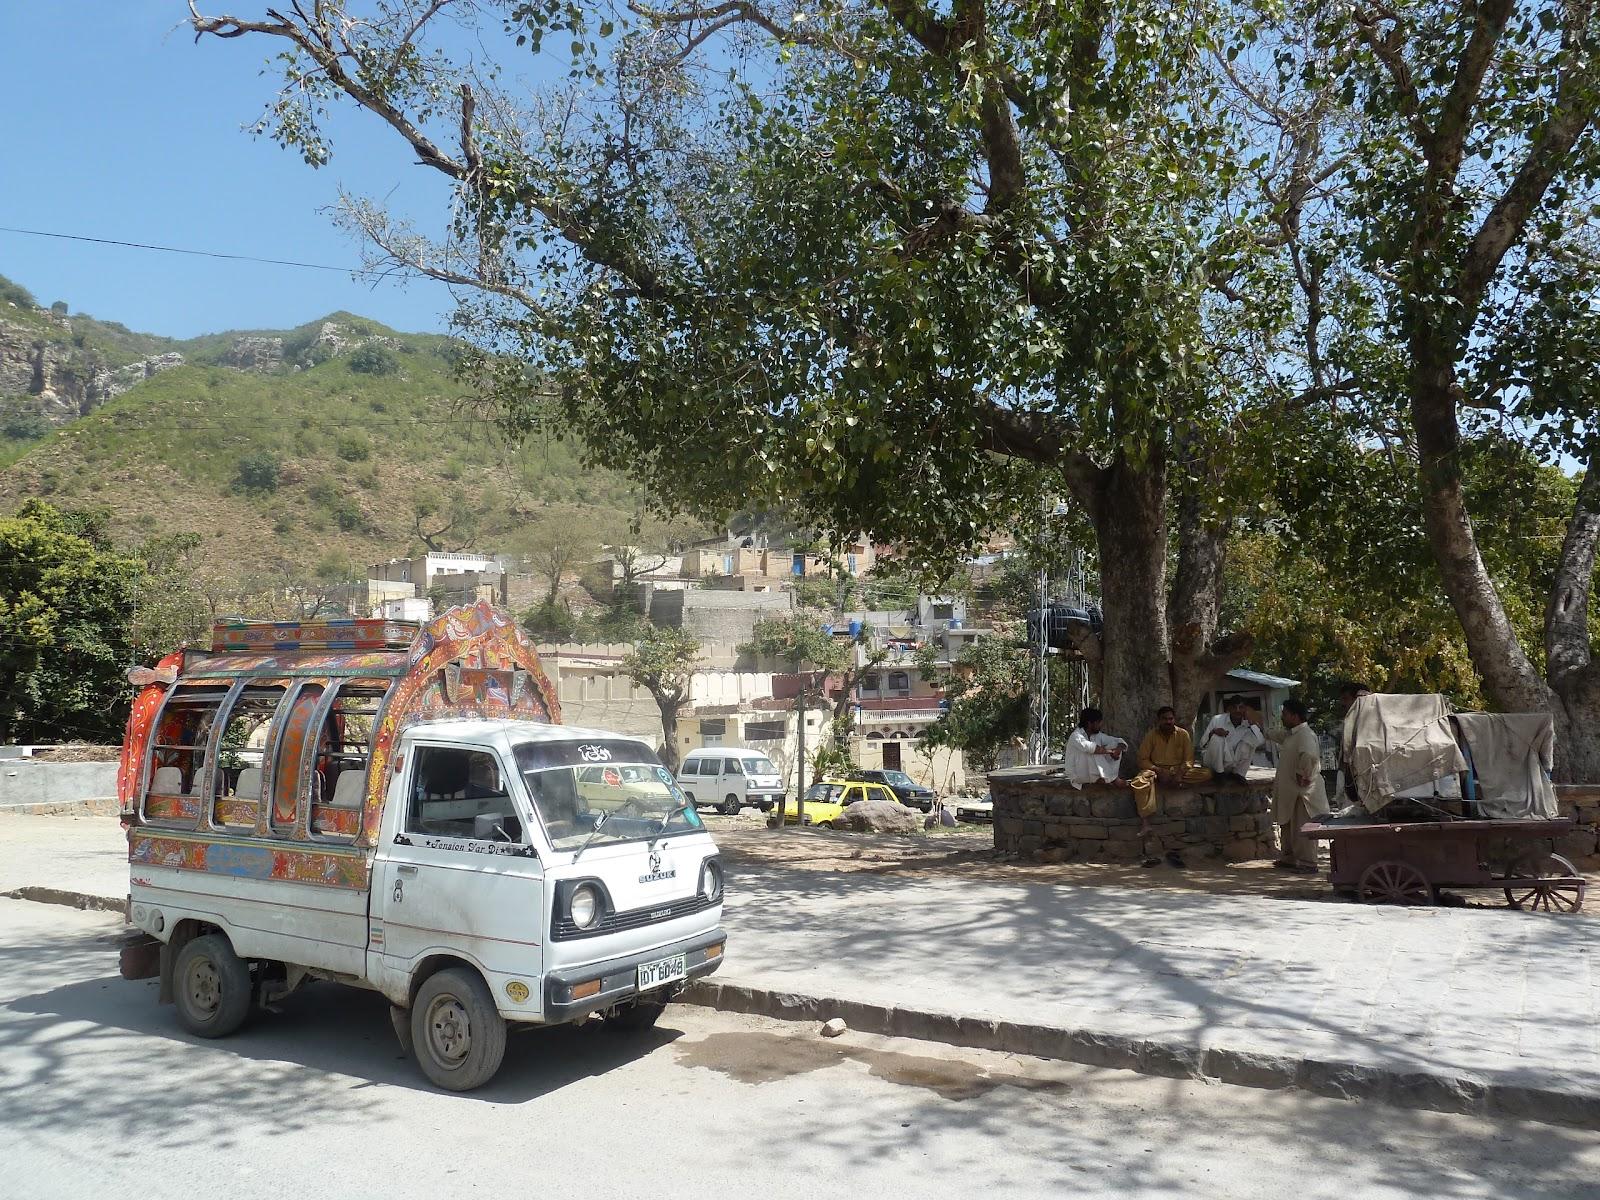 an unforgettable trip in islamabad Unforgettable tour with bro babusar top to islamabad  islamabad to gilgit via babusar/naran/kaghan - duration:  road trip, naran to saifal maluk lake.